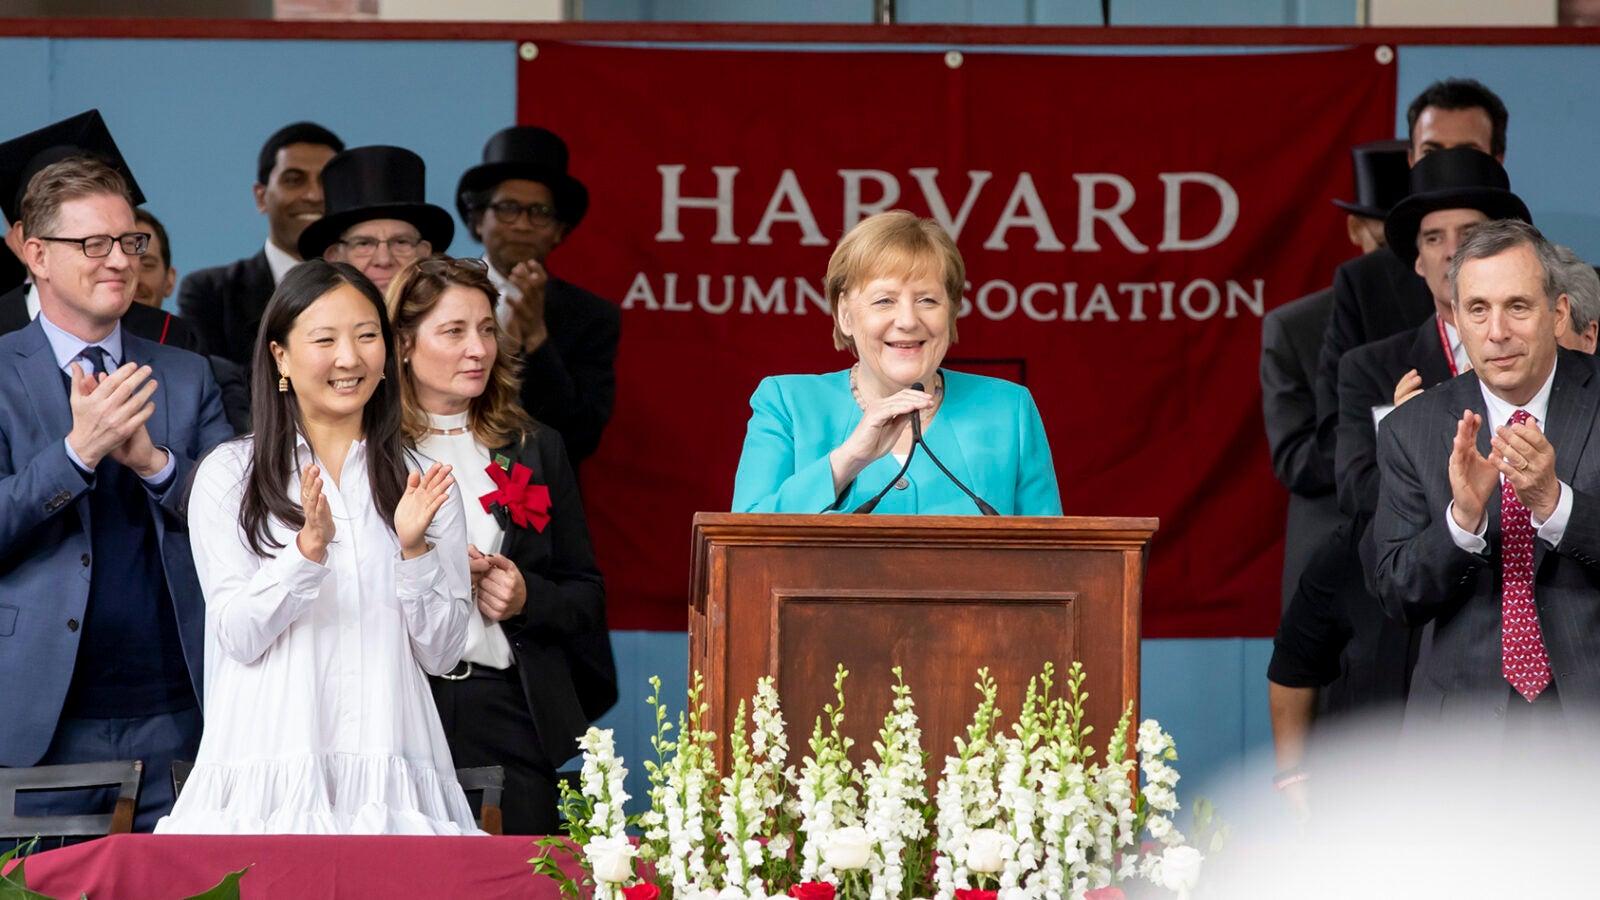 Angela Merkel speaks from podium.